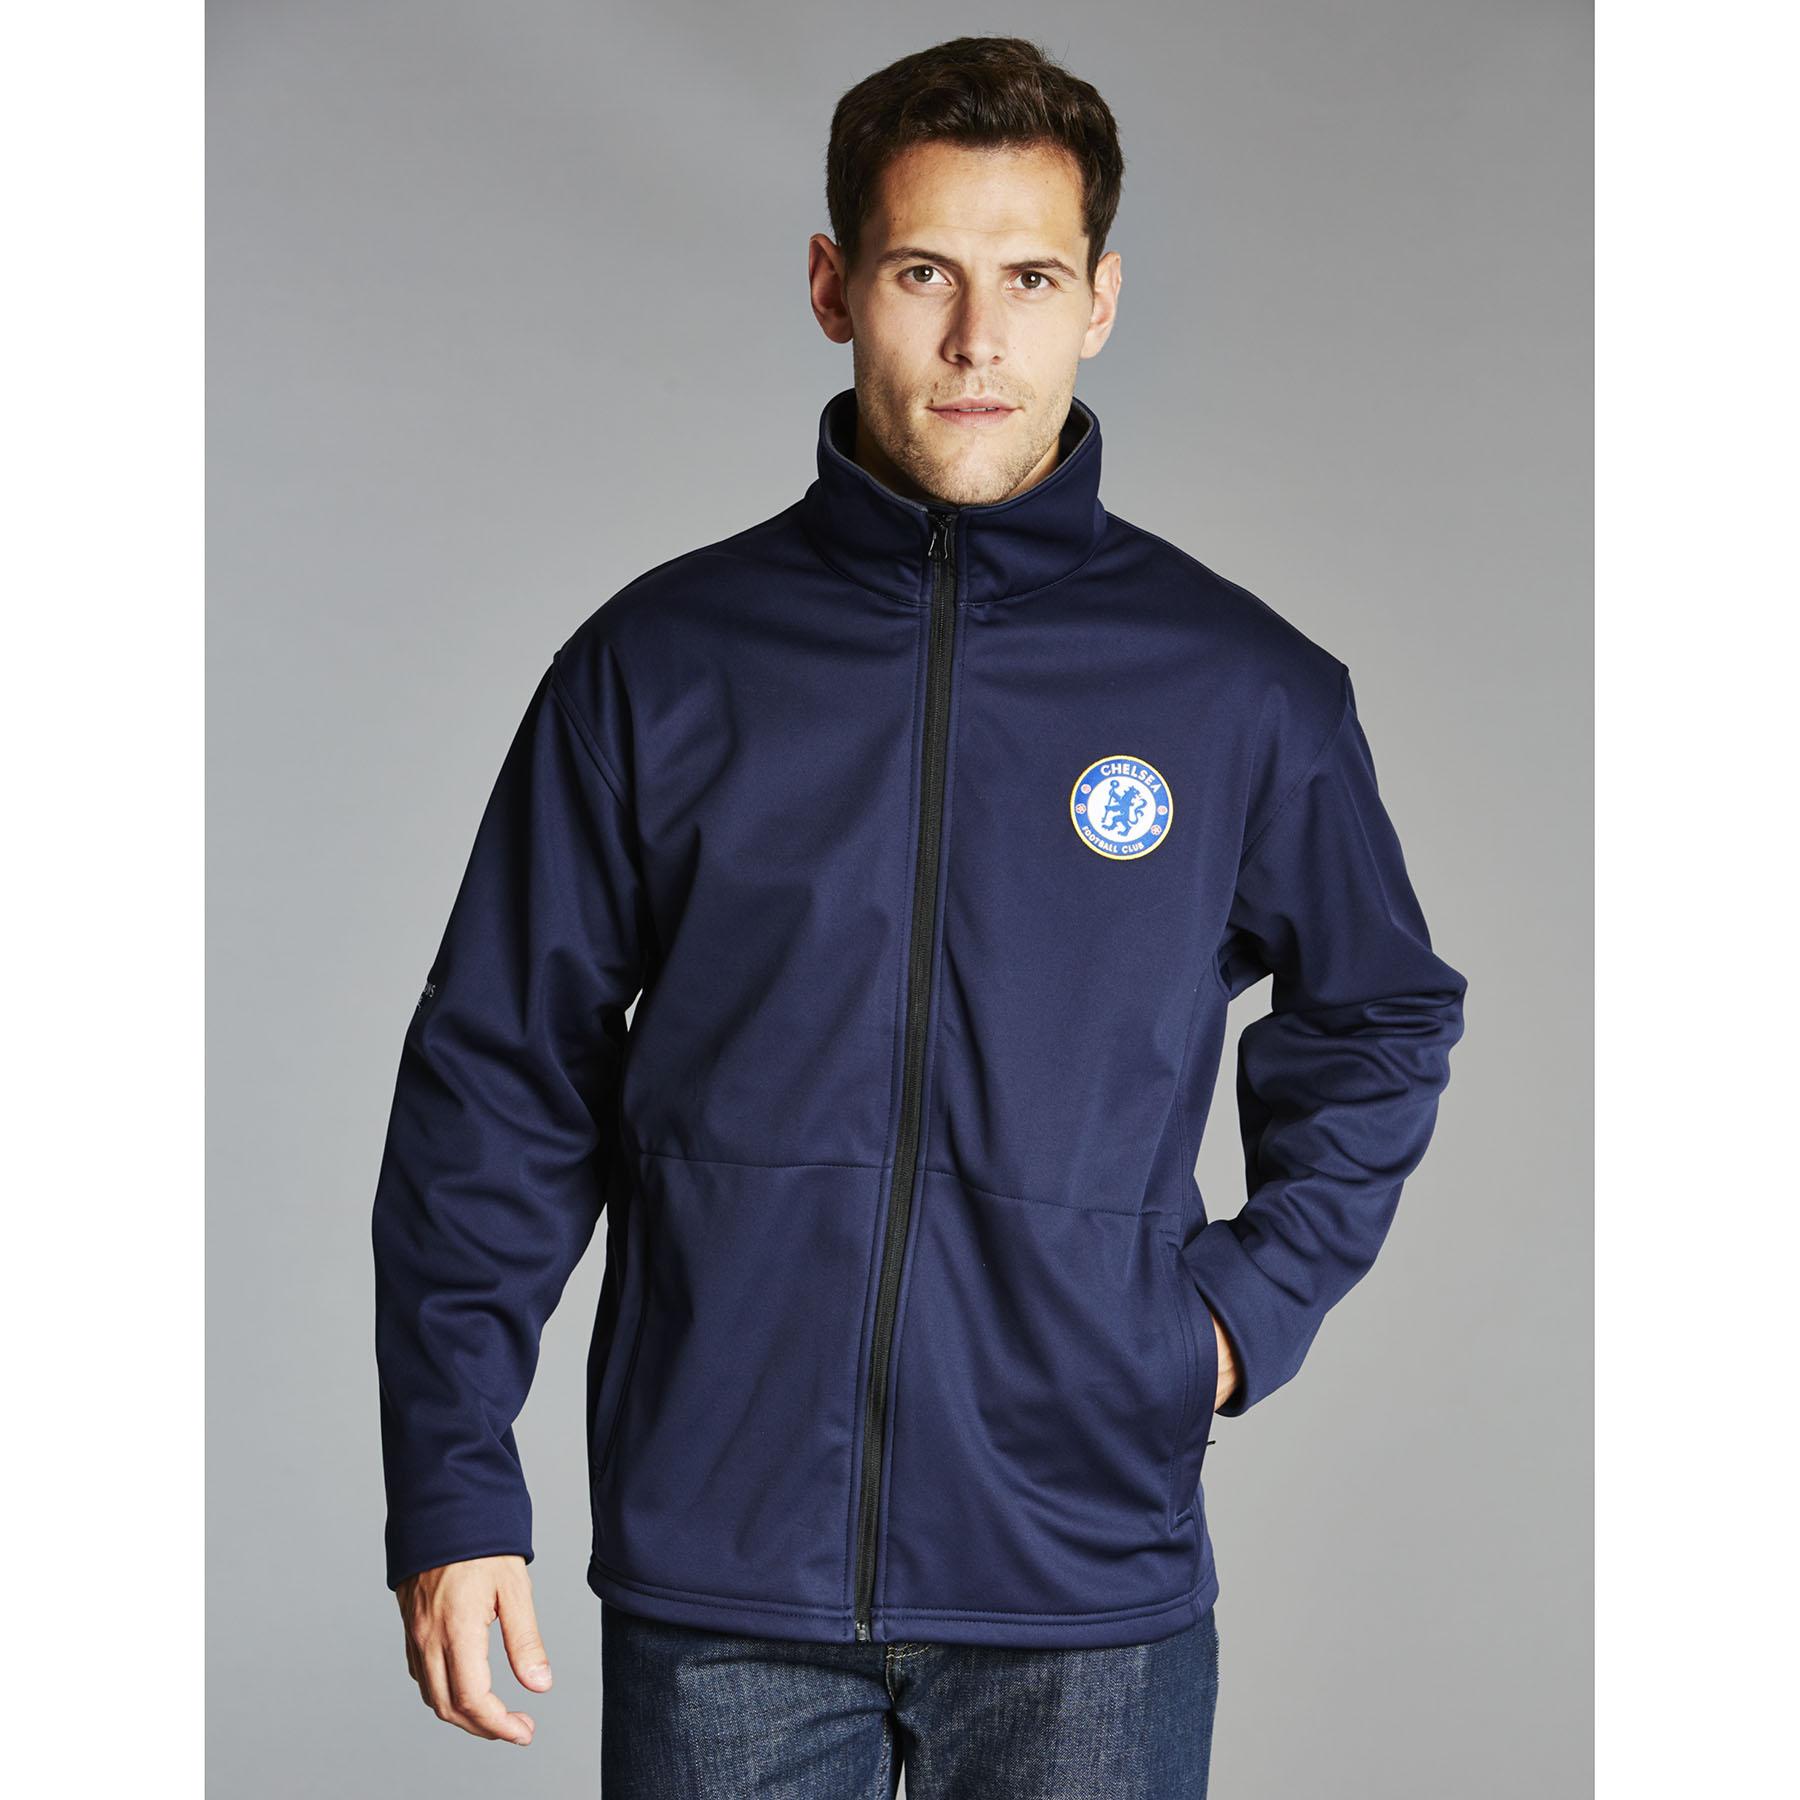 Chelsea UEFA Champions League Soft Shell Jacket - Navy - Mens